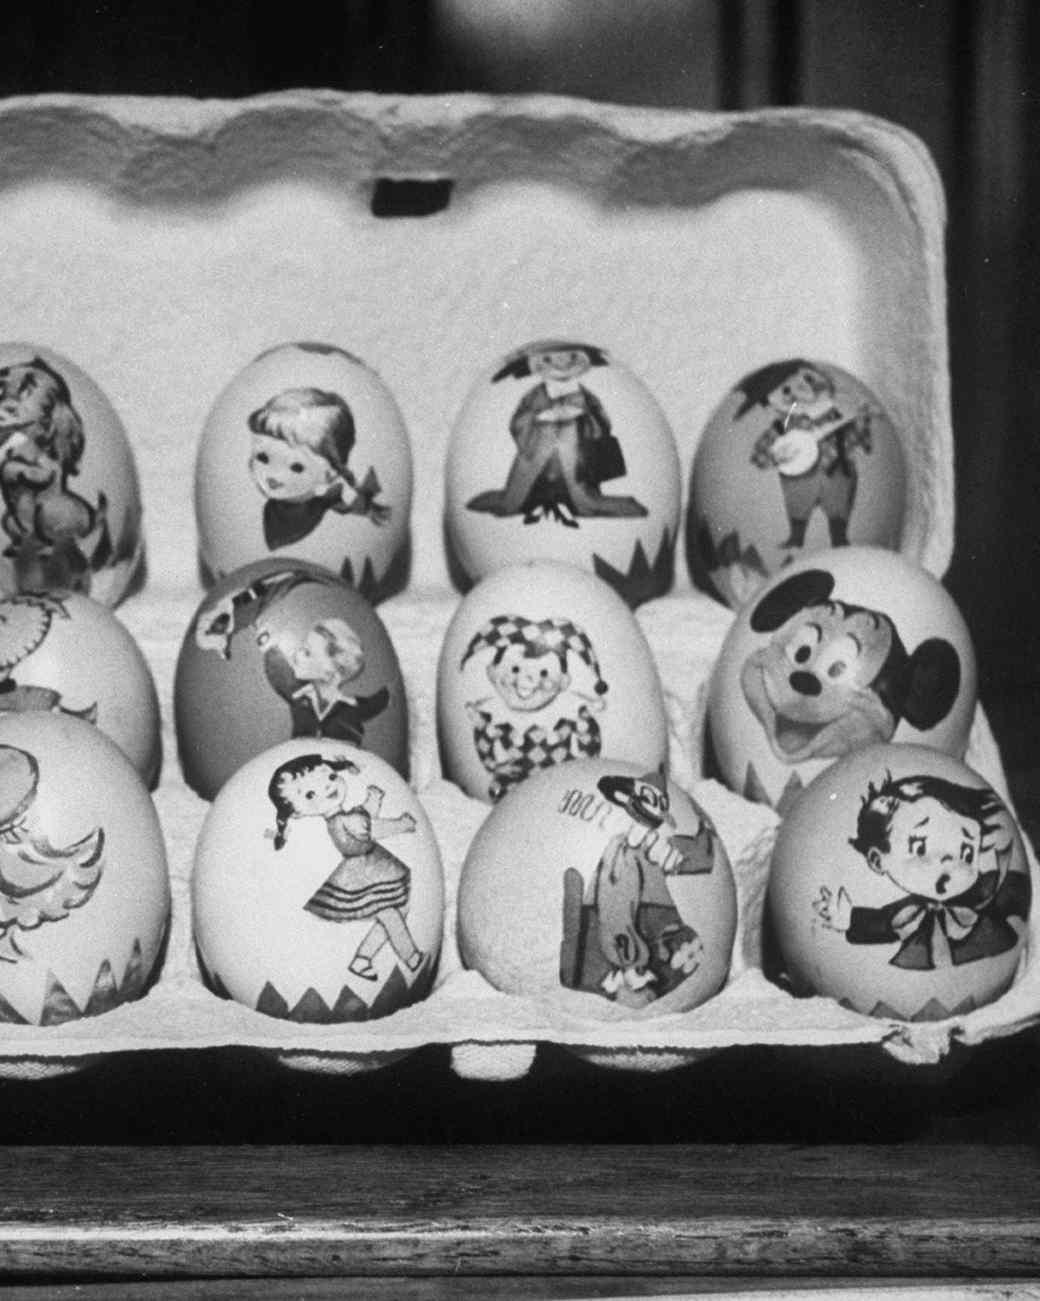 decorated eggs in carton